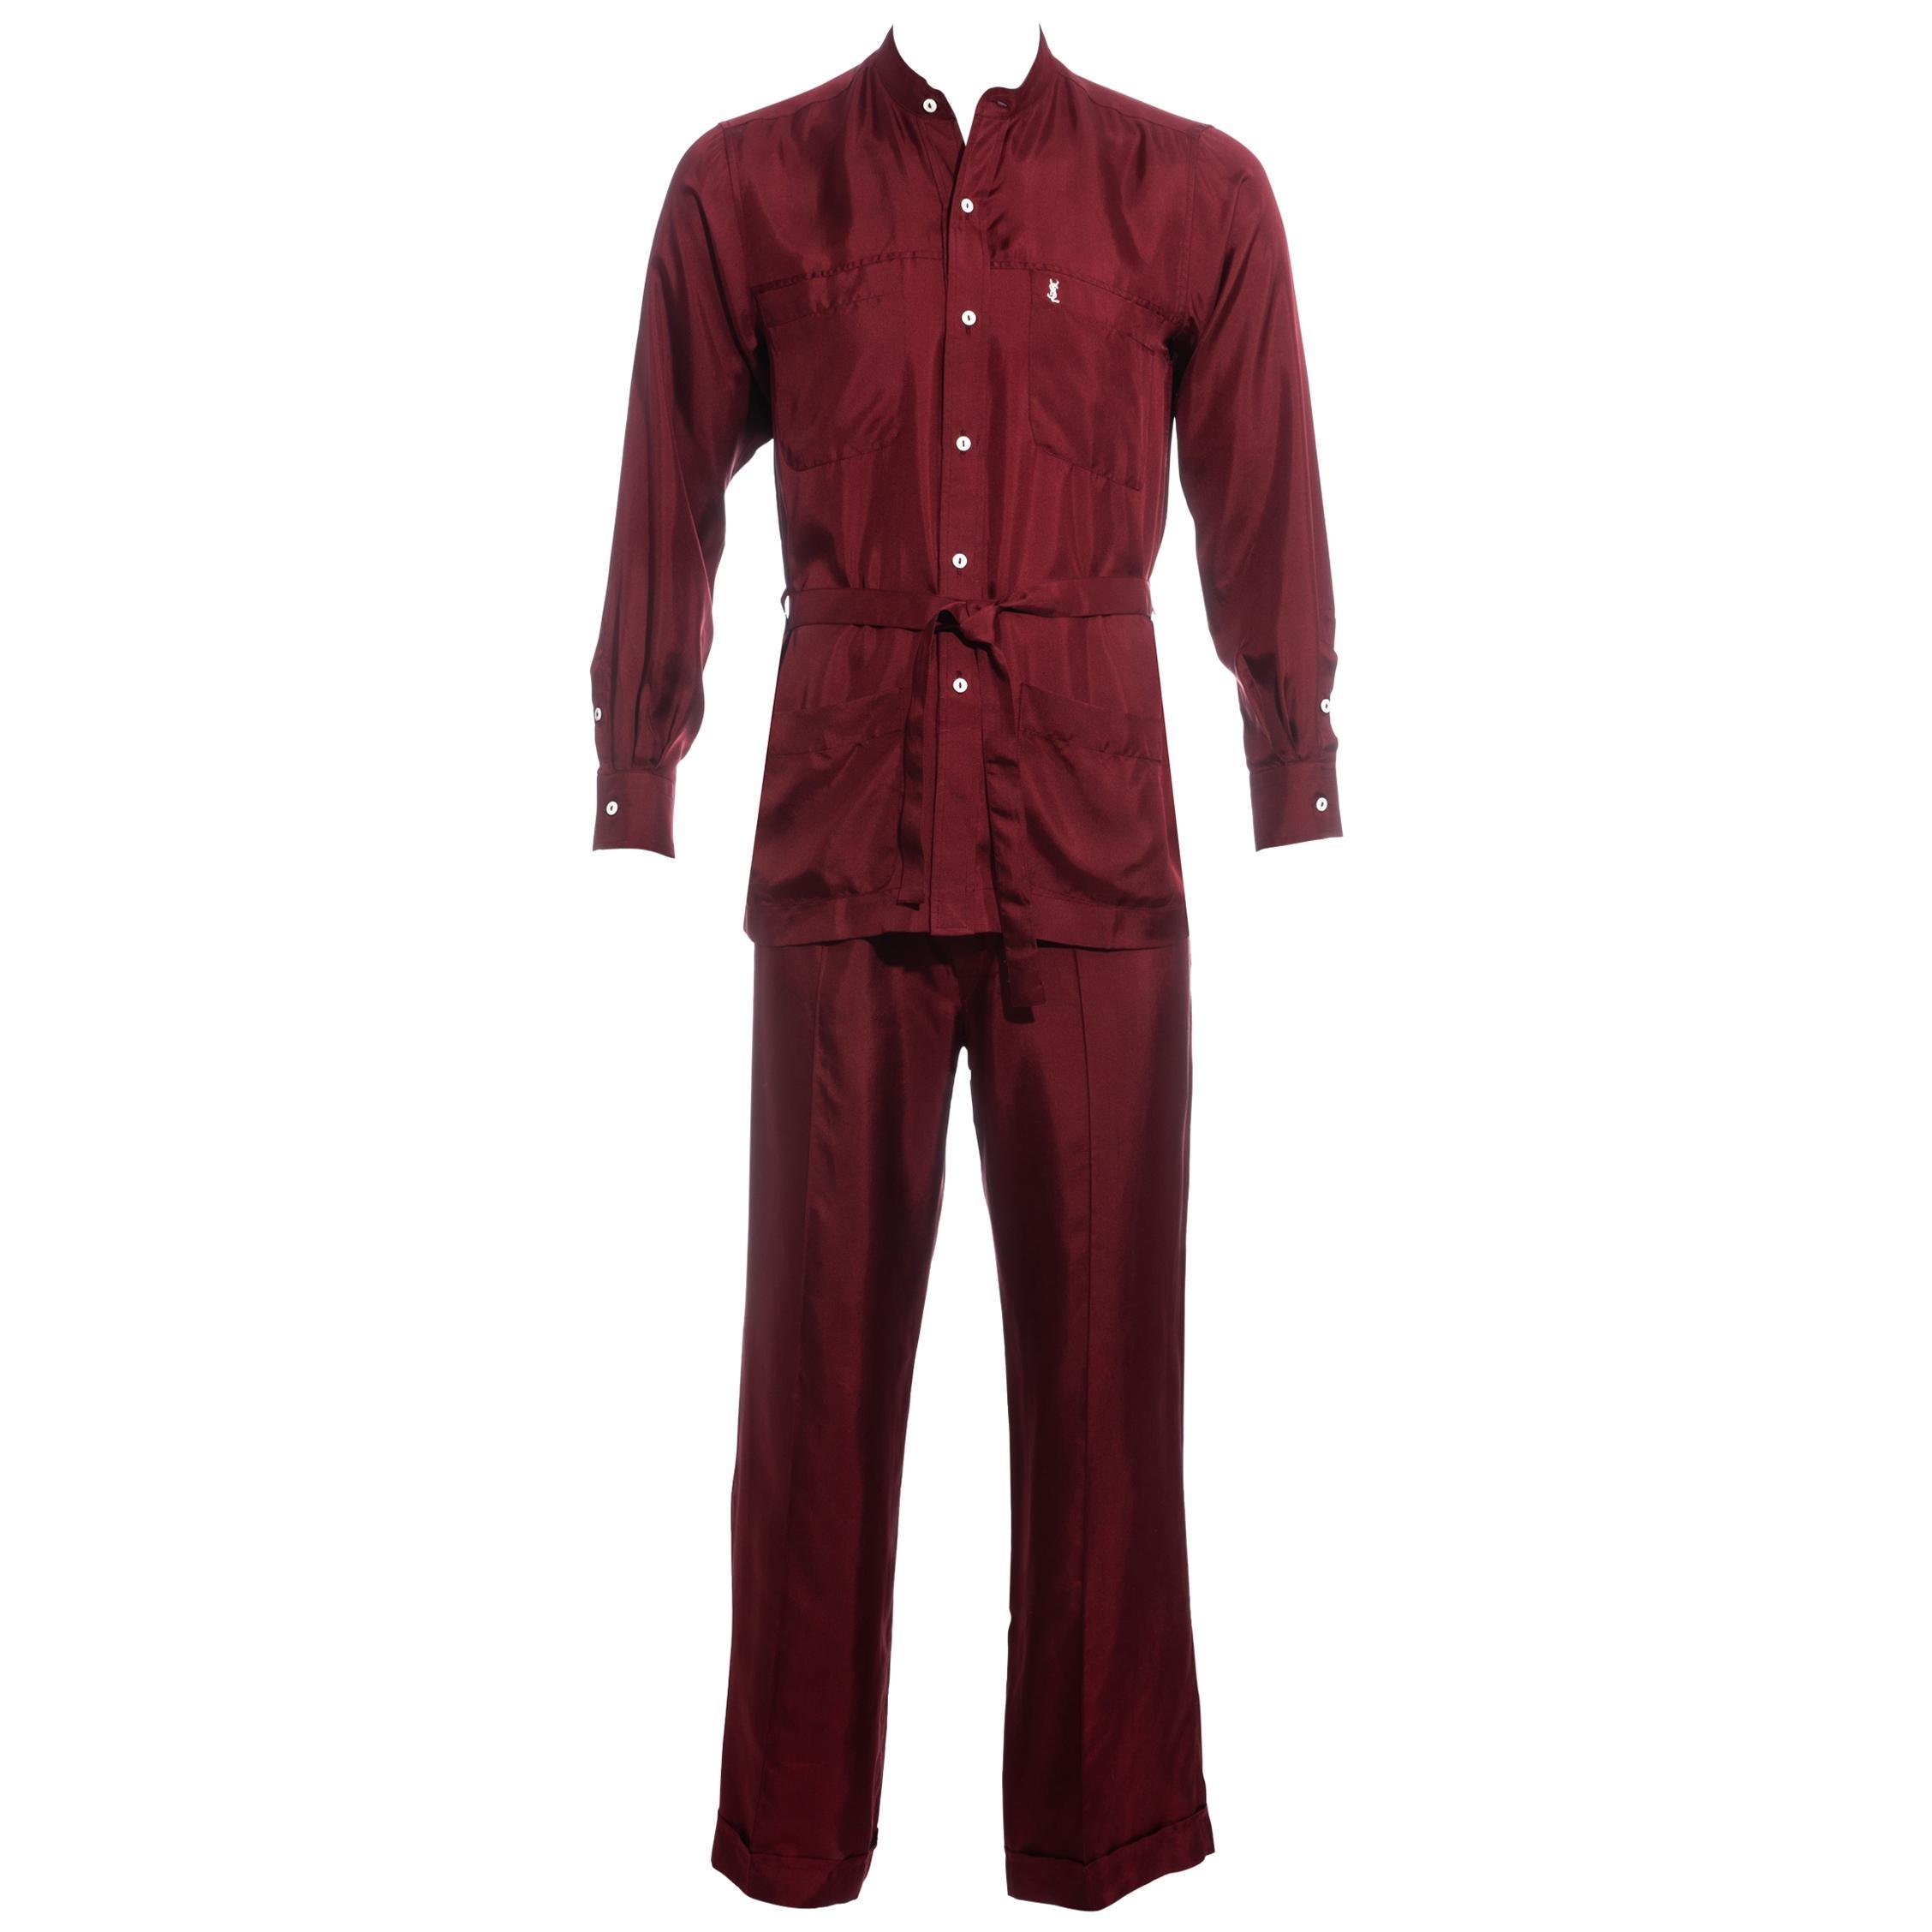 Men's Yves Saint Laurent red silk leisure suit, ss 1978